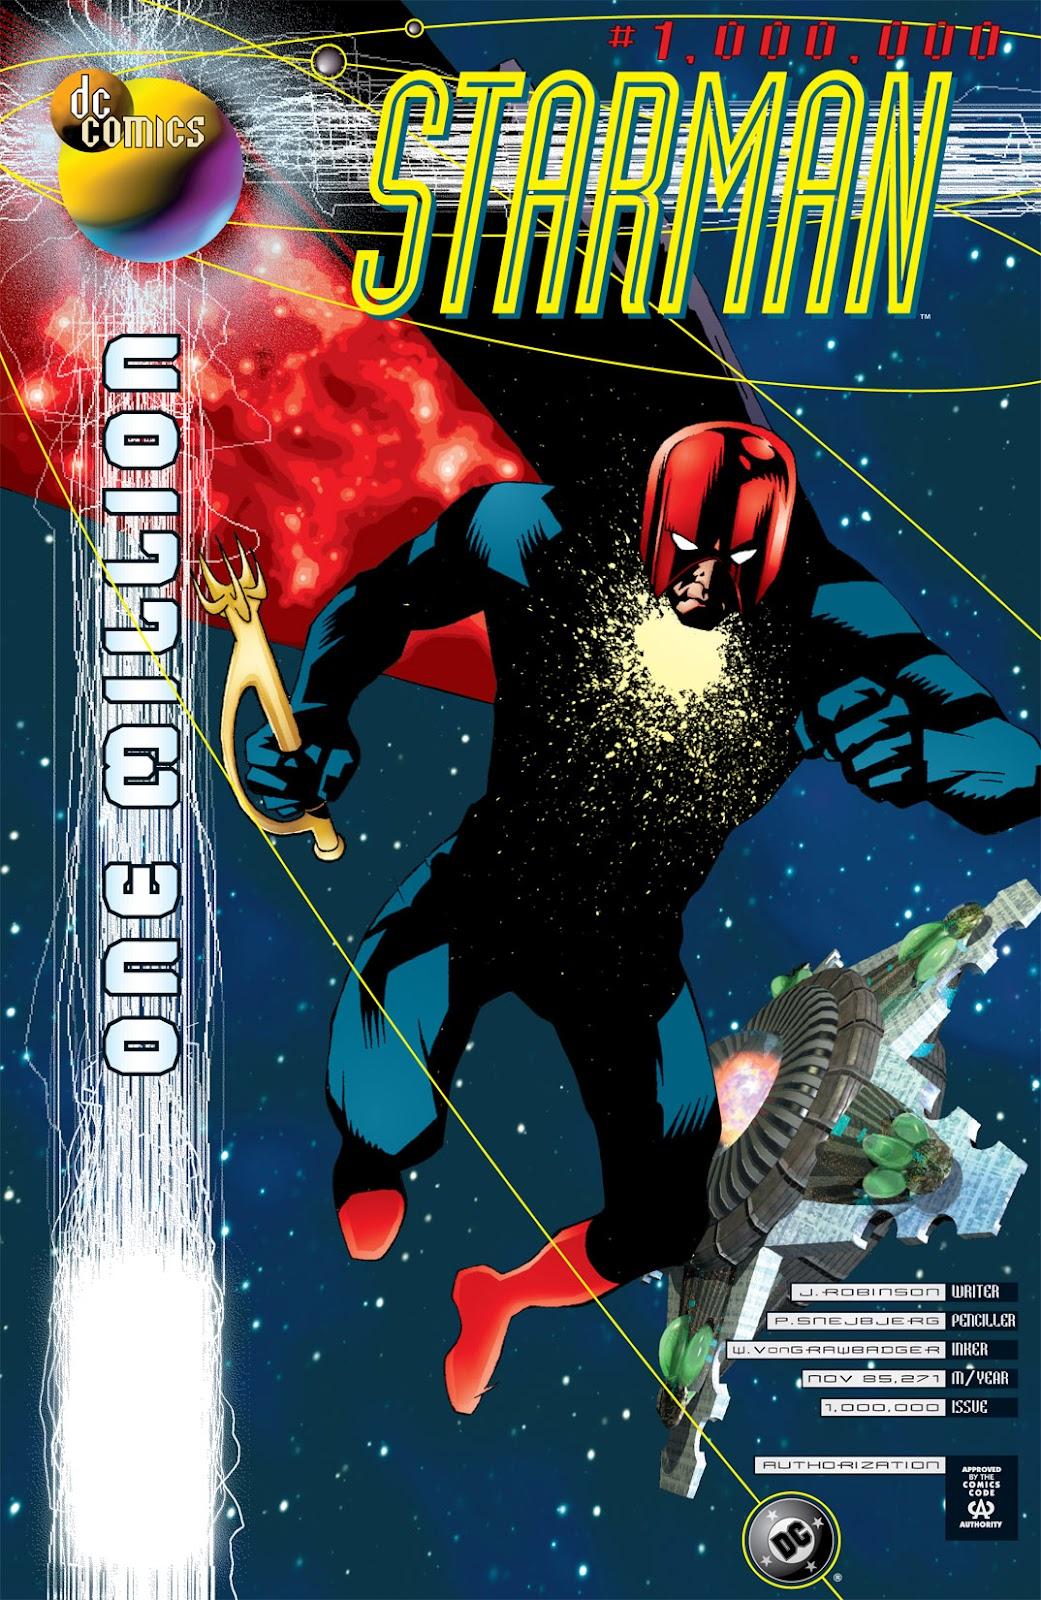 Starman (1994) Issue #1000000 #83 - English 1